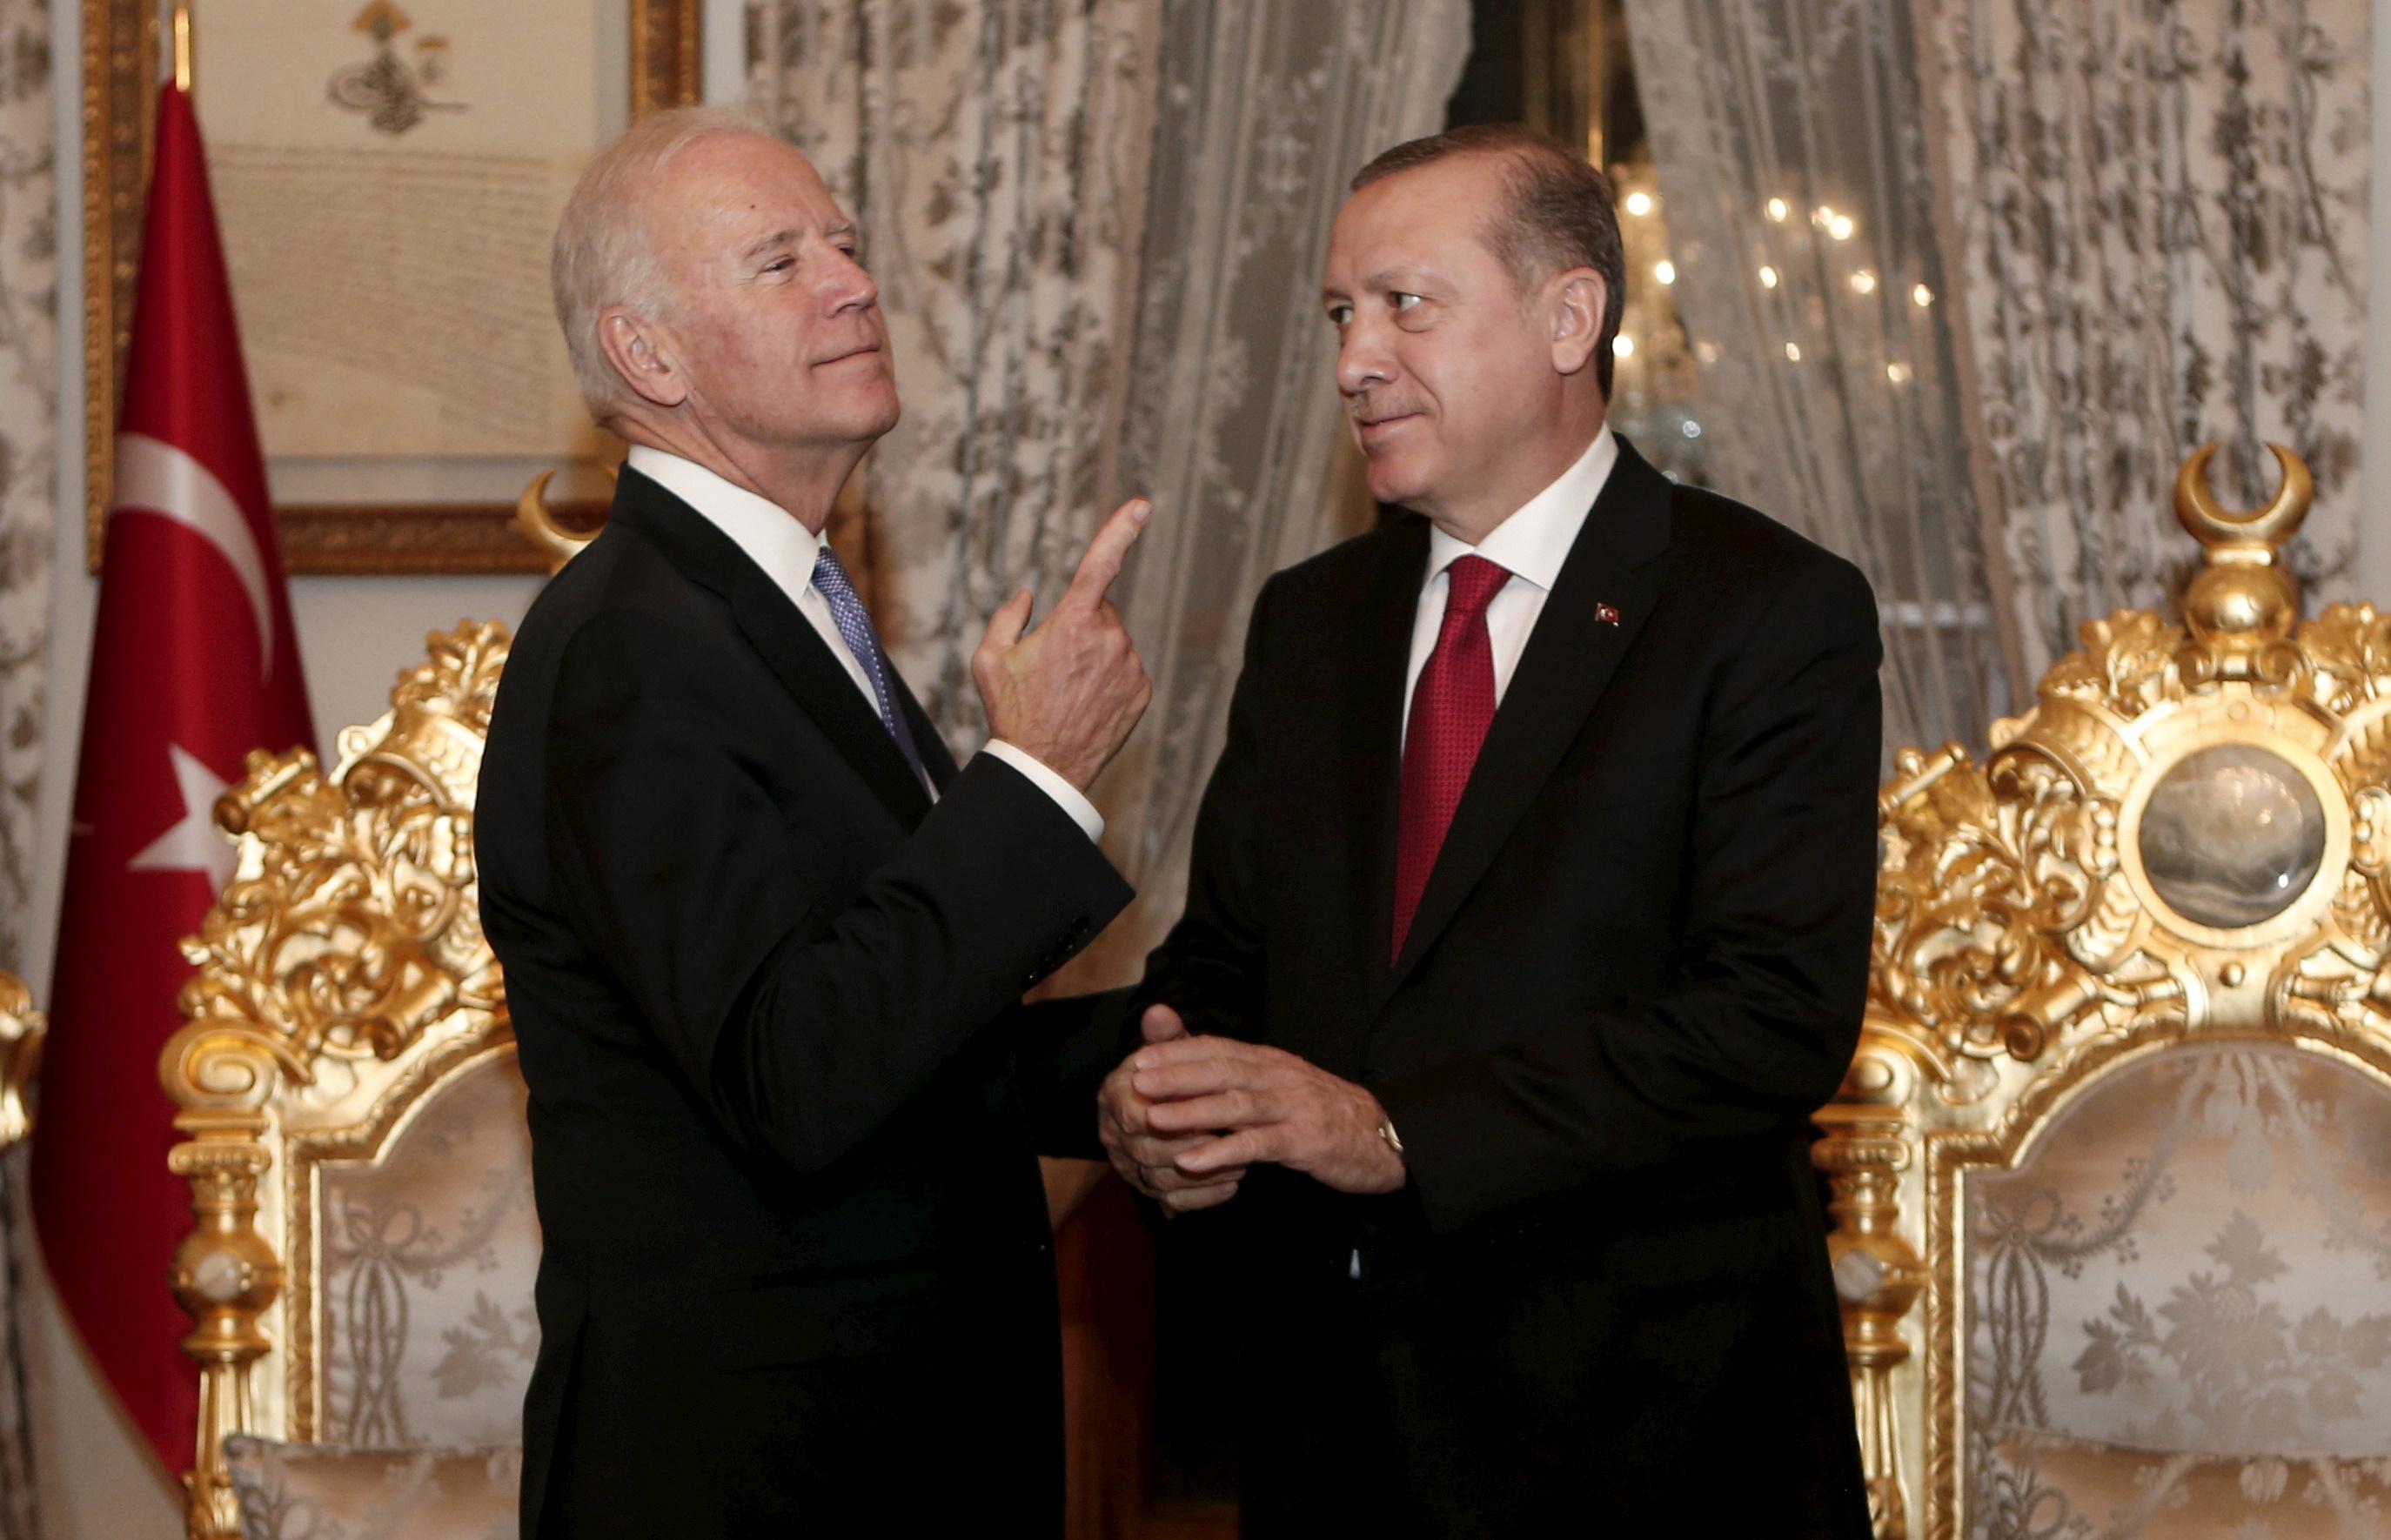 Turkish President Tayyip Erdogan (R) and U.S. Vice President Joe Biden chat after their meeting in Istanbul, Turkey January 23, 2016. REUTERS/Sedat Suna/Pool/File Photo